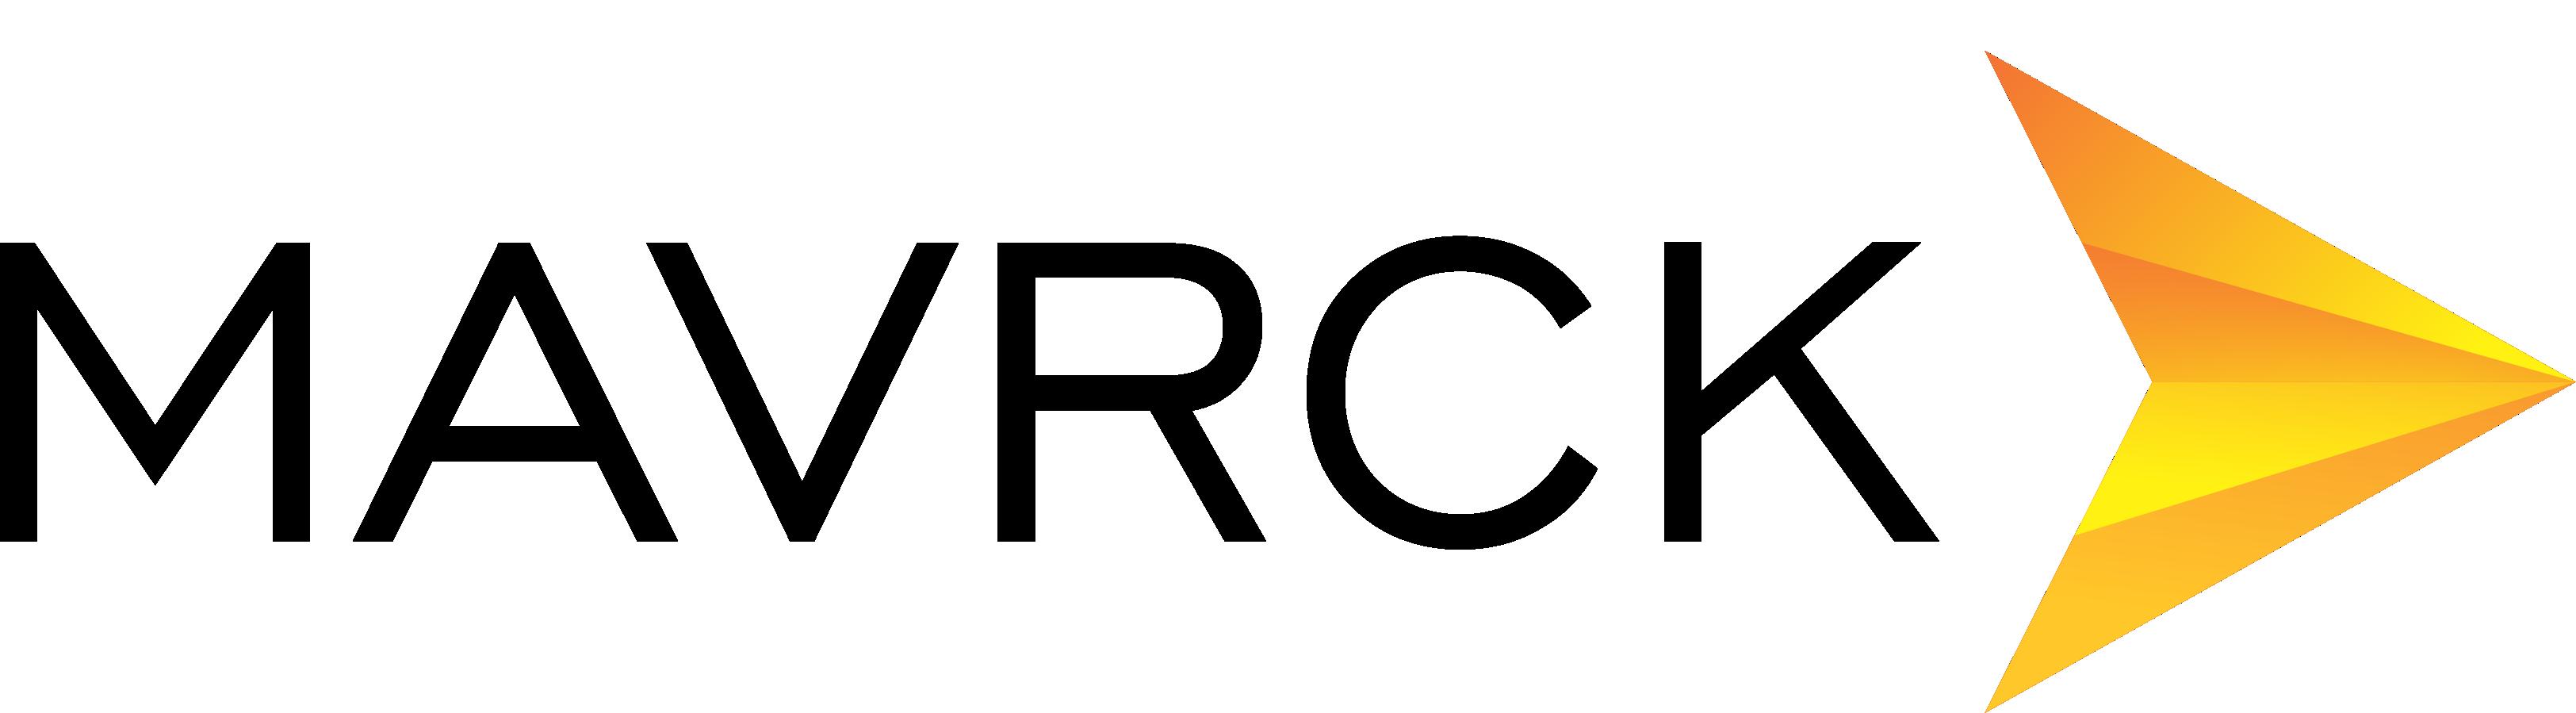 mavrcklogo